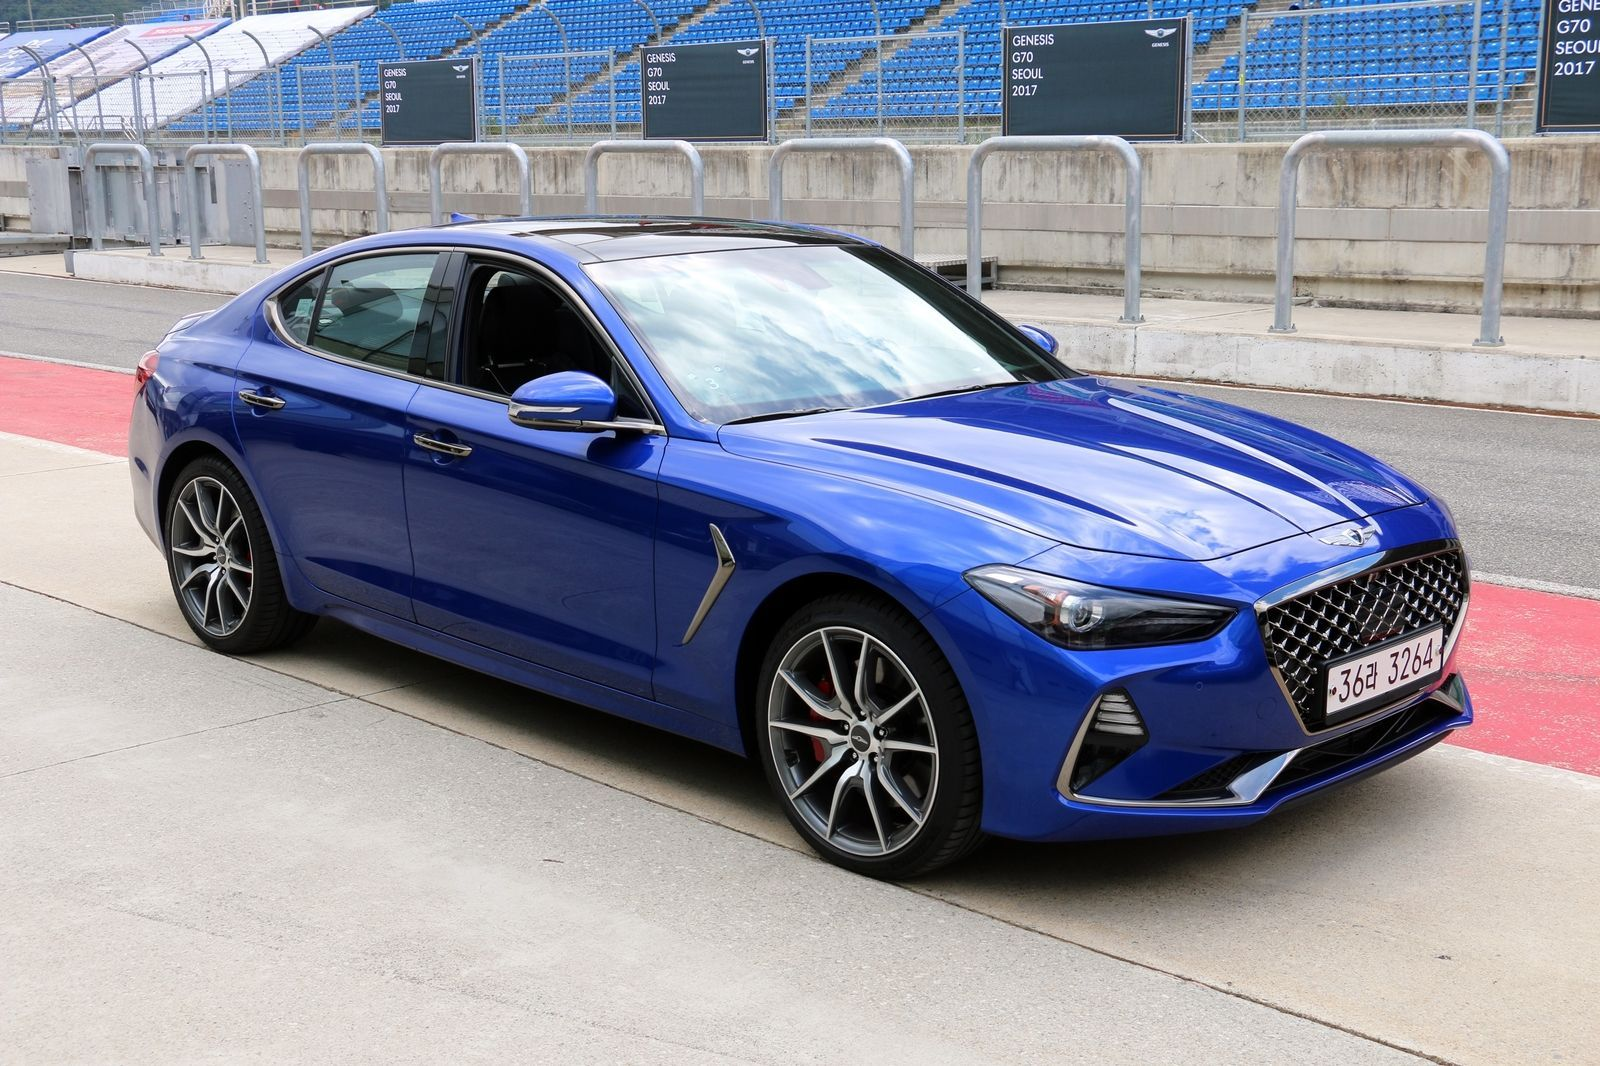 2018 Genesis G70 First Drive First drive, Super cars